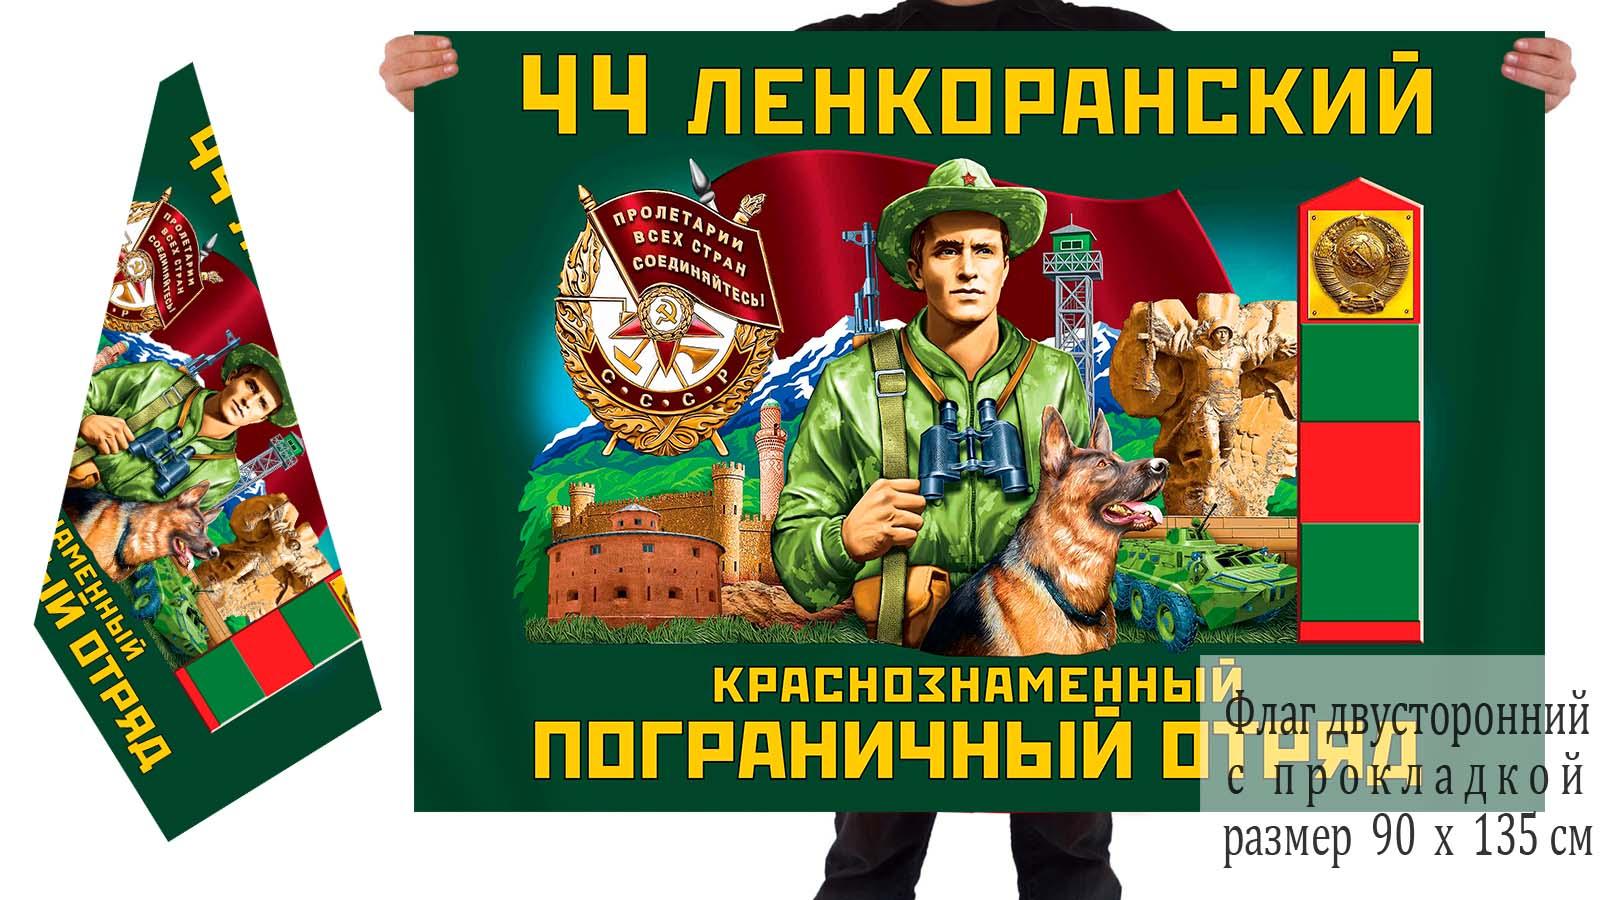 Двусторонний флаг 44 Ленкоранского Краснознамённого погранотряда